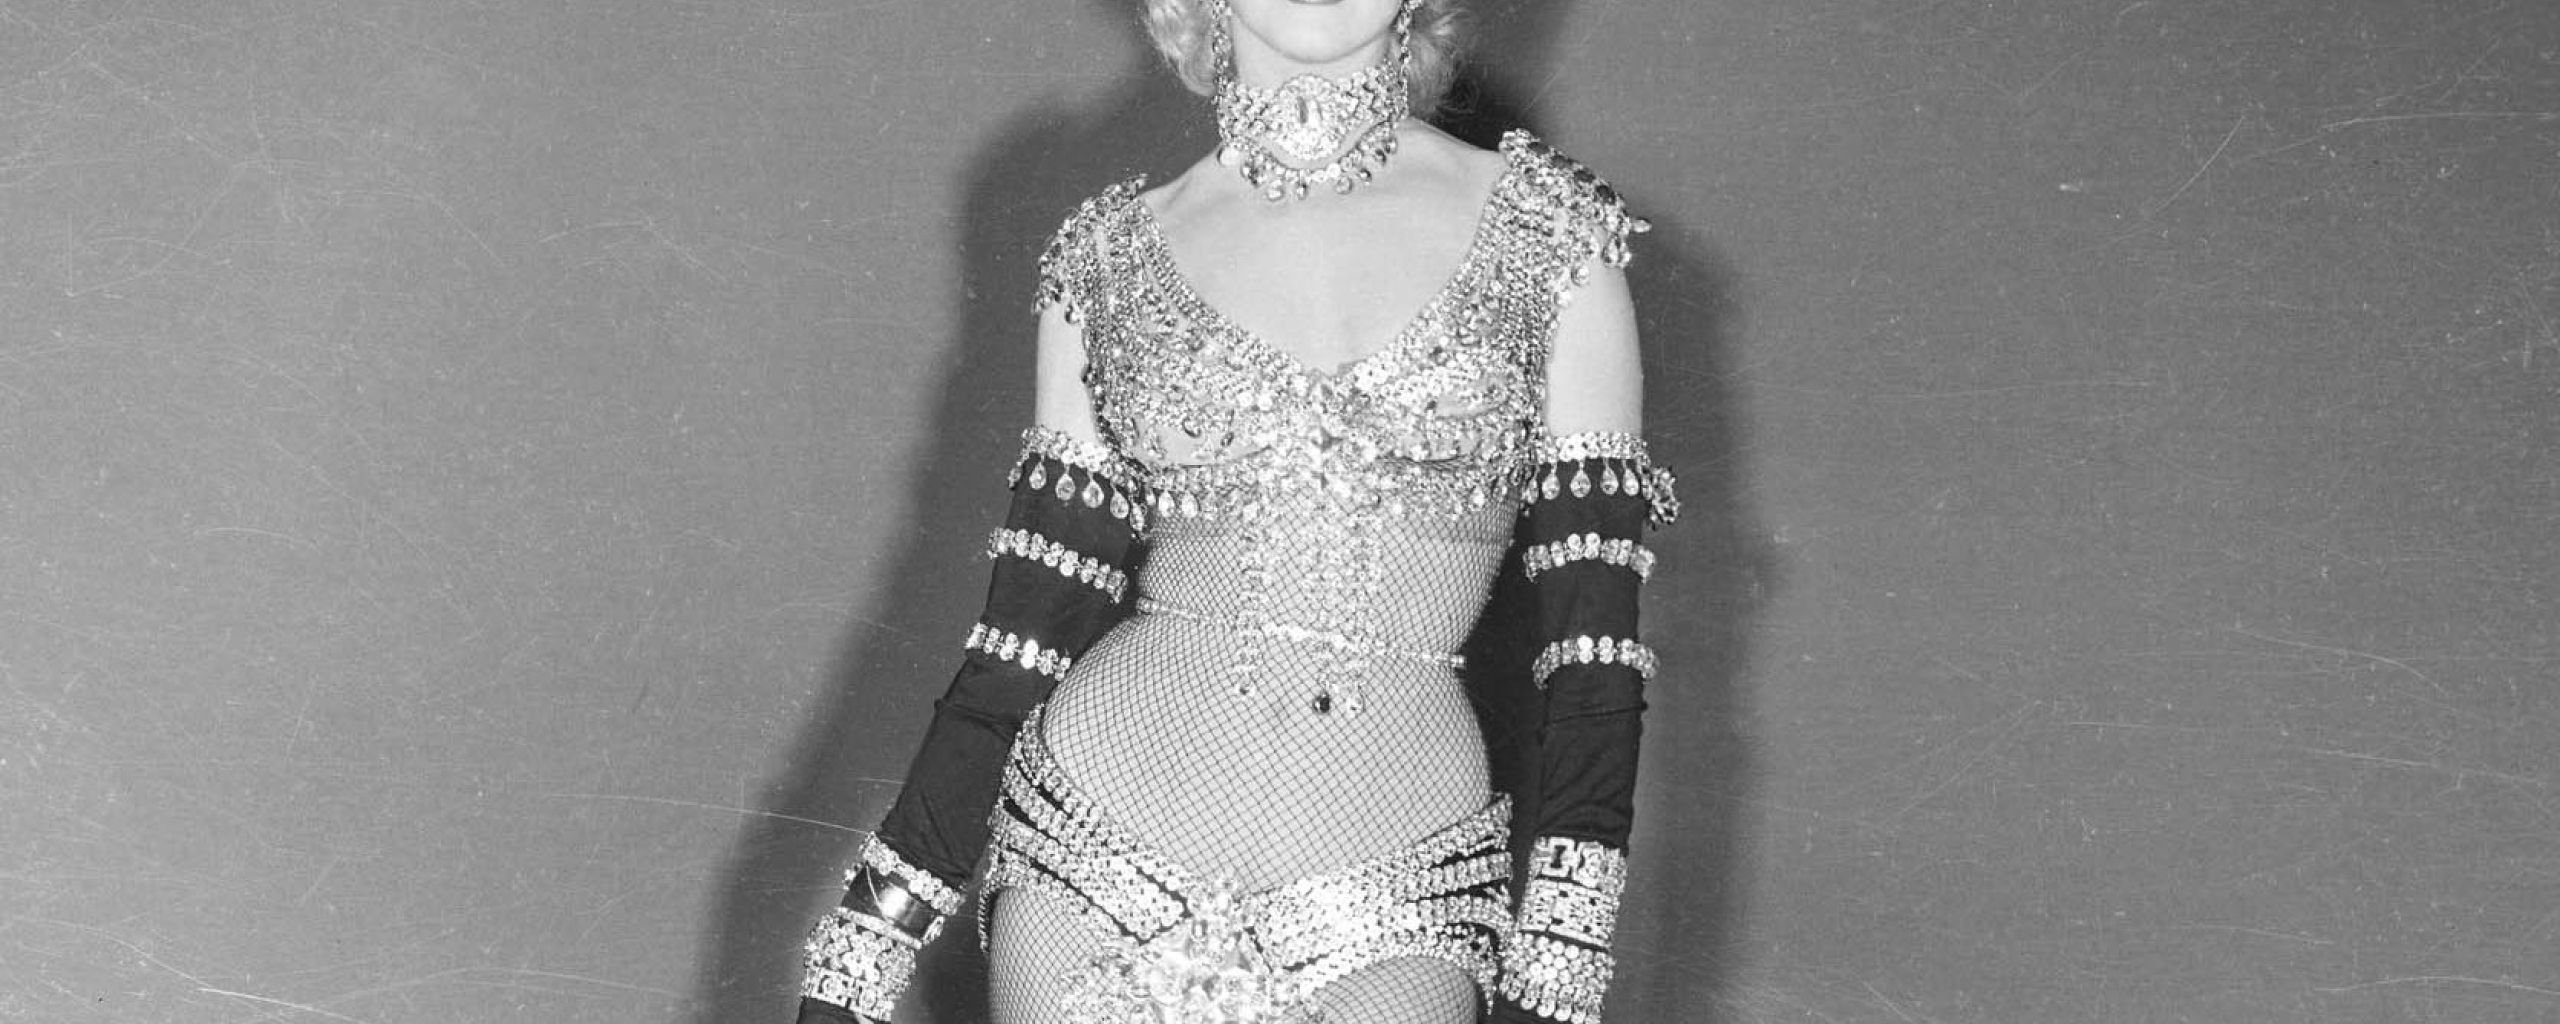 Marilyn monroe new look full hd wallpaper - Marilyn monroe wallpaper download ...